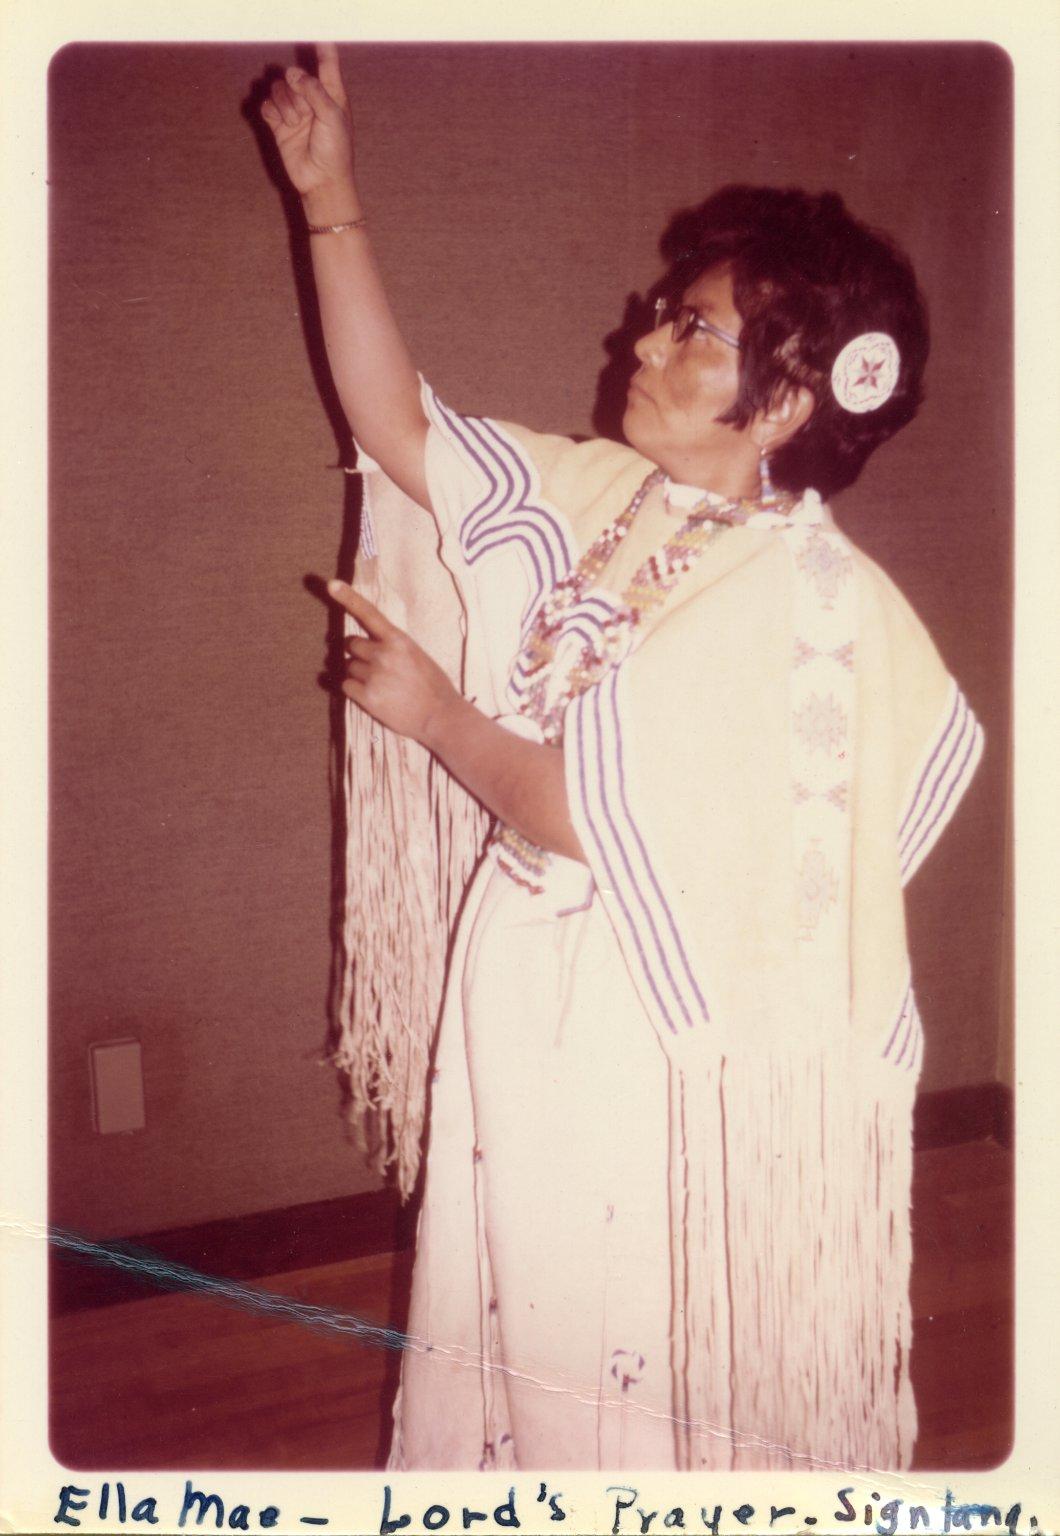 Ella Mae Vigil saying the Lord's Prayer in Plains Indian sign language